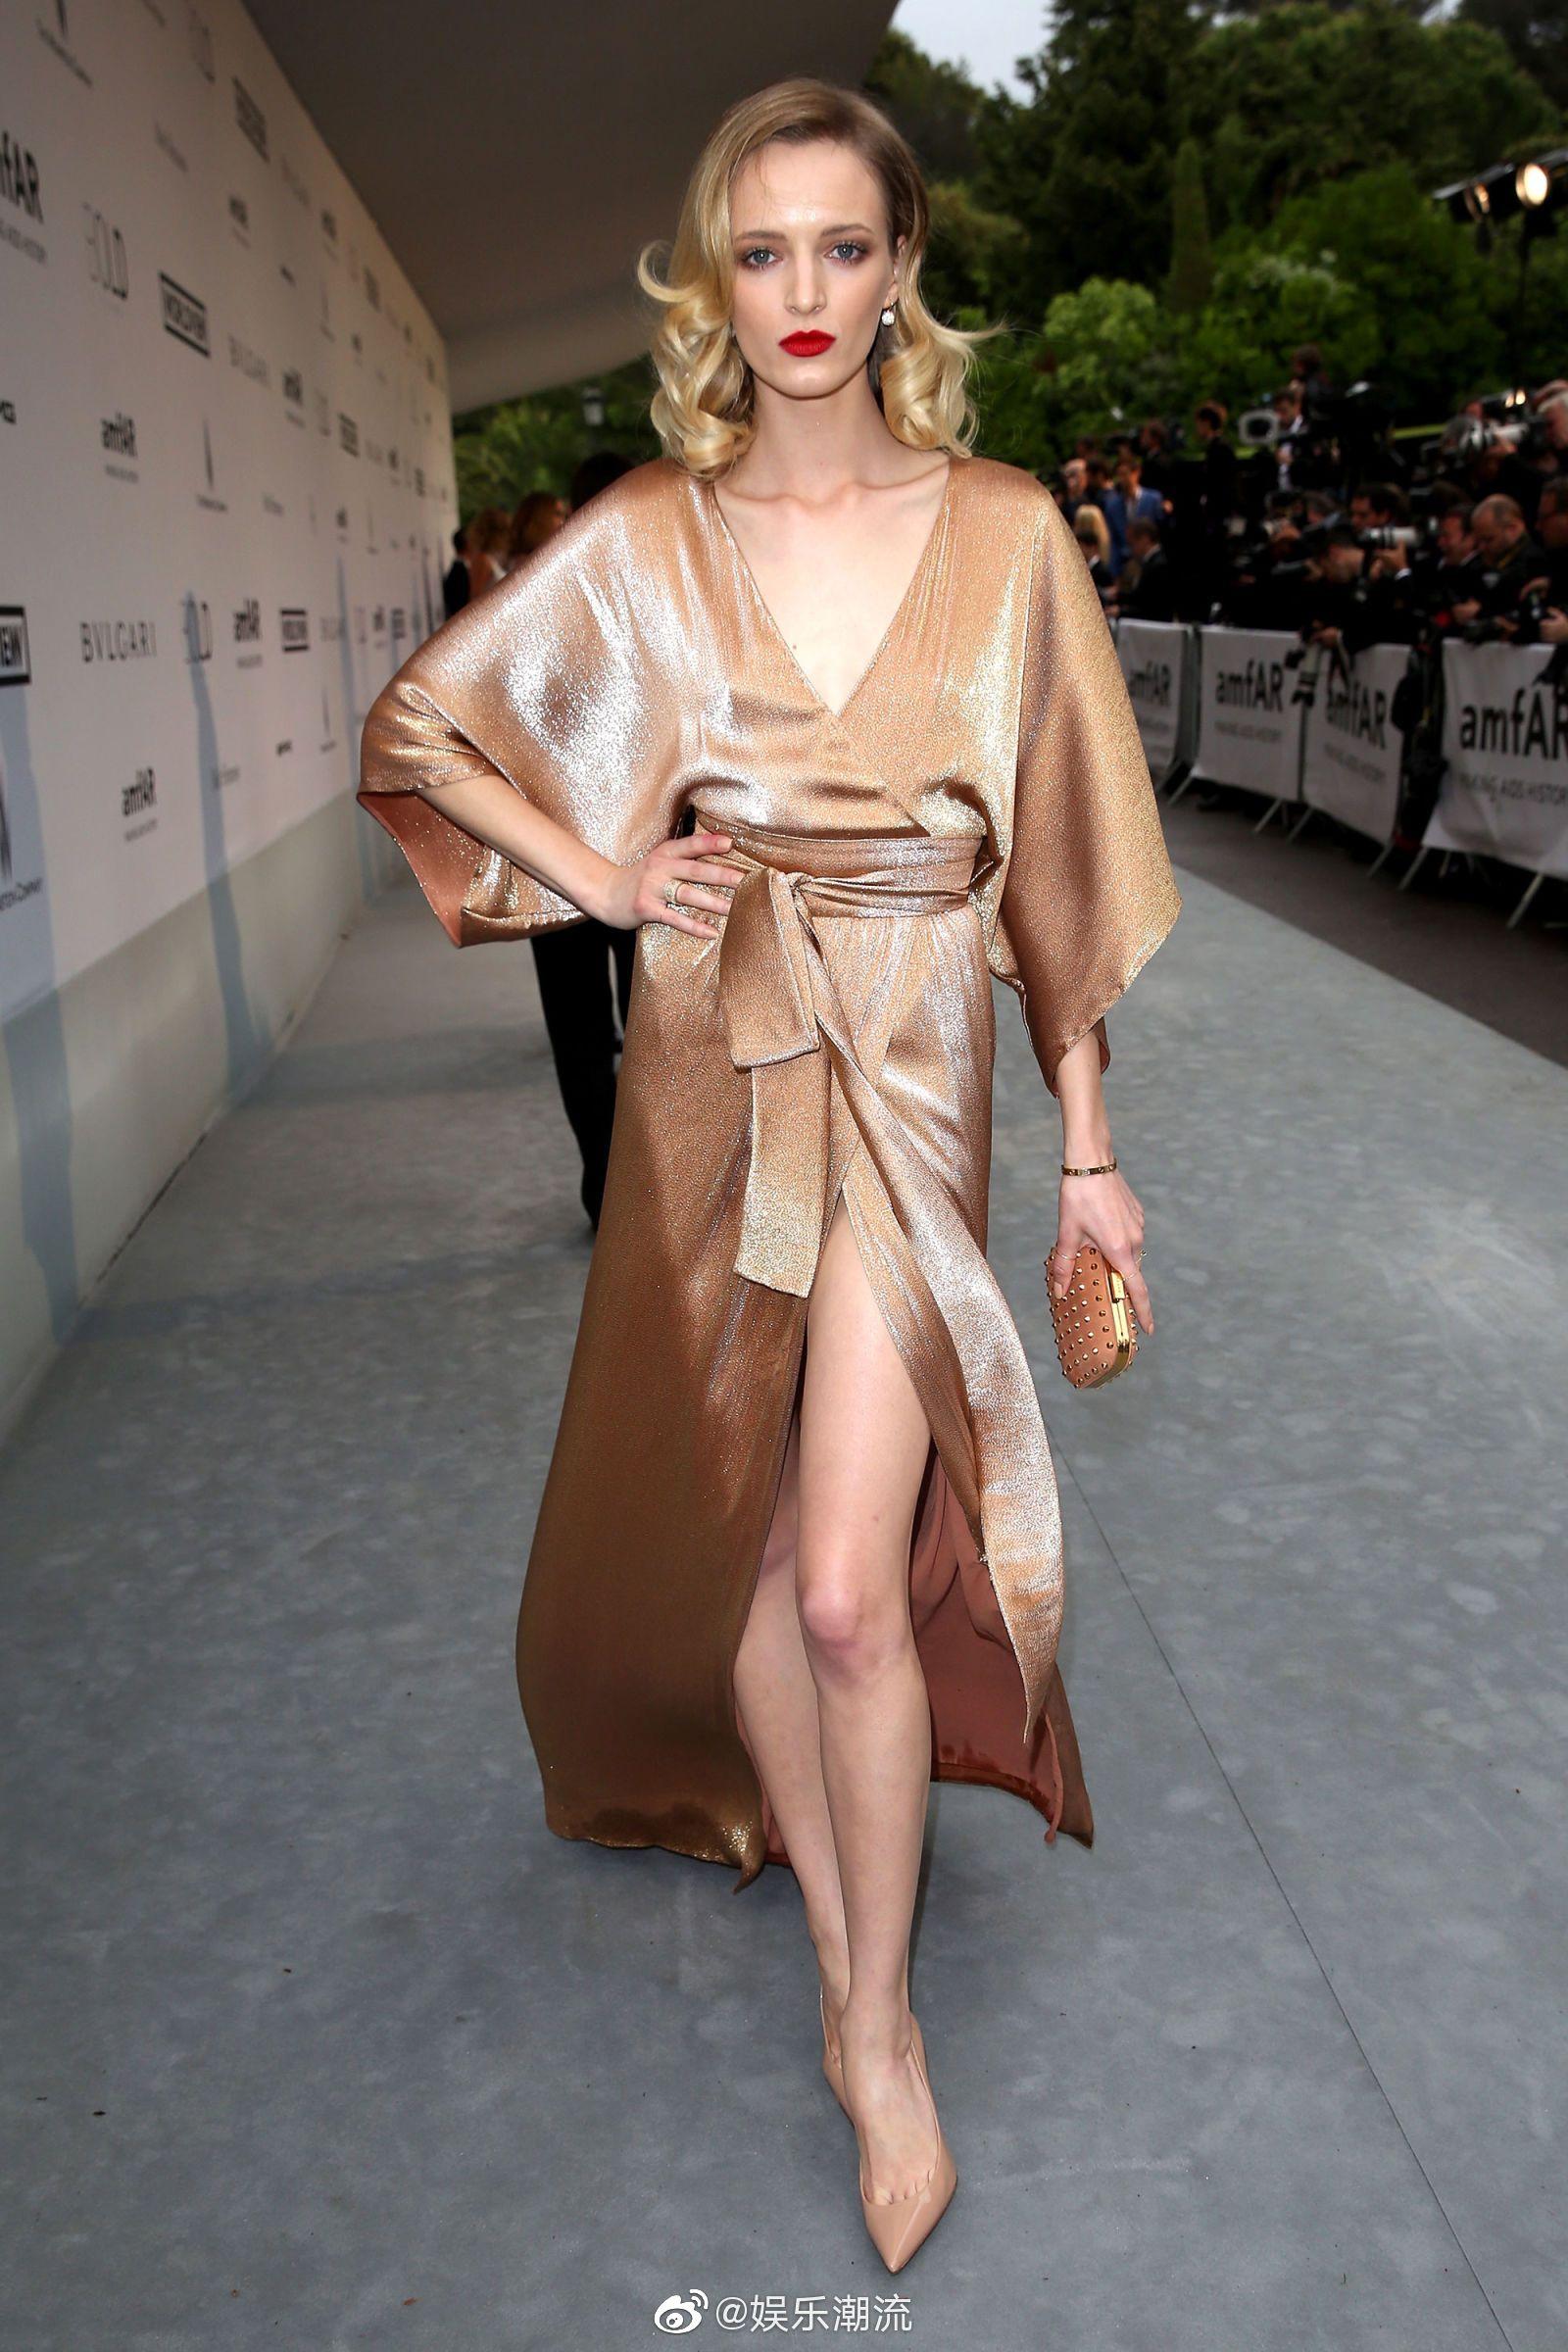 Daria Strokous × 2014年戛纳电影节造型 | 一袭香槟色长袍